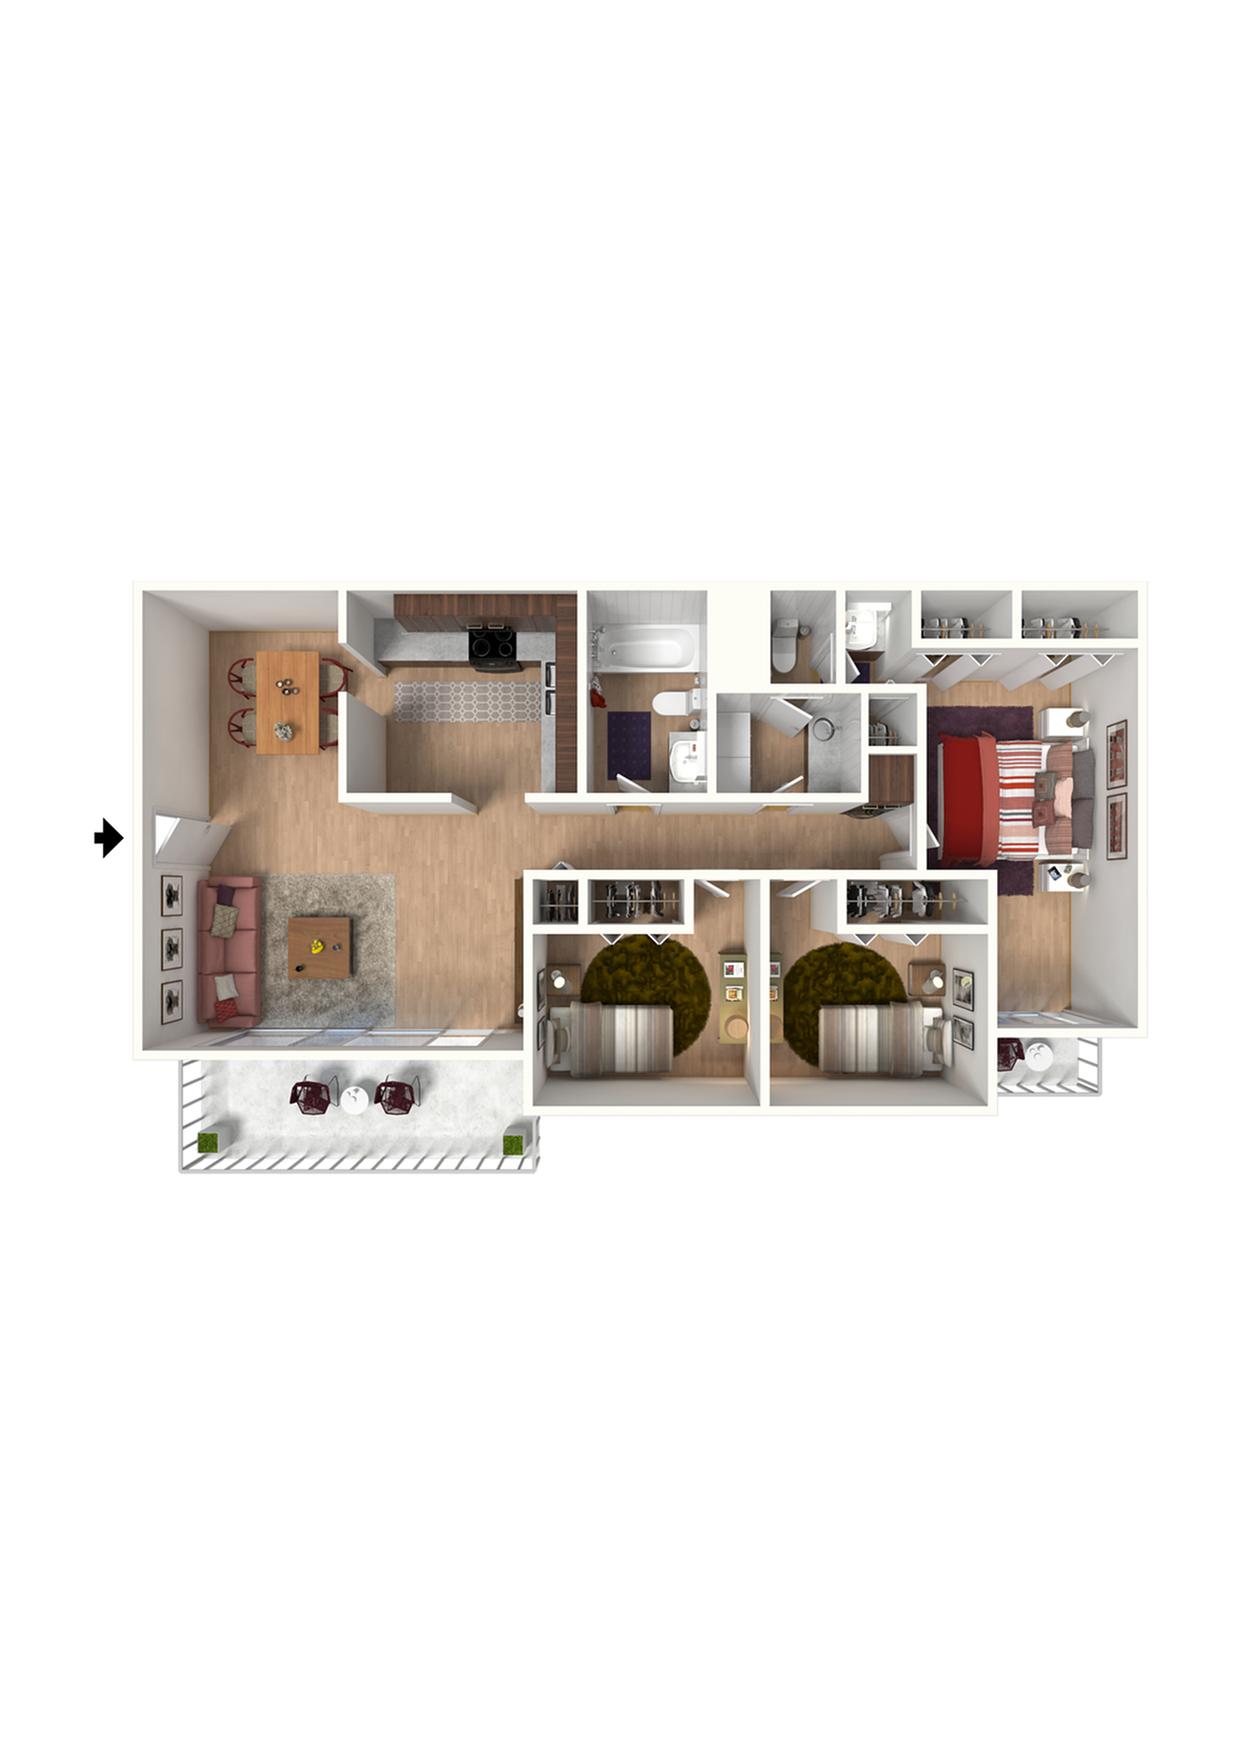 C1 Floorplan: 3 Bedroom, 2 Bathroom - 1300 sqft